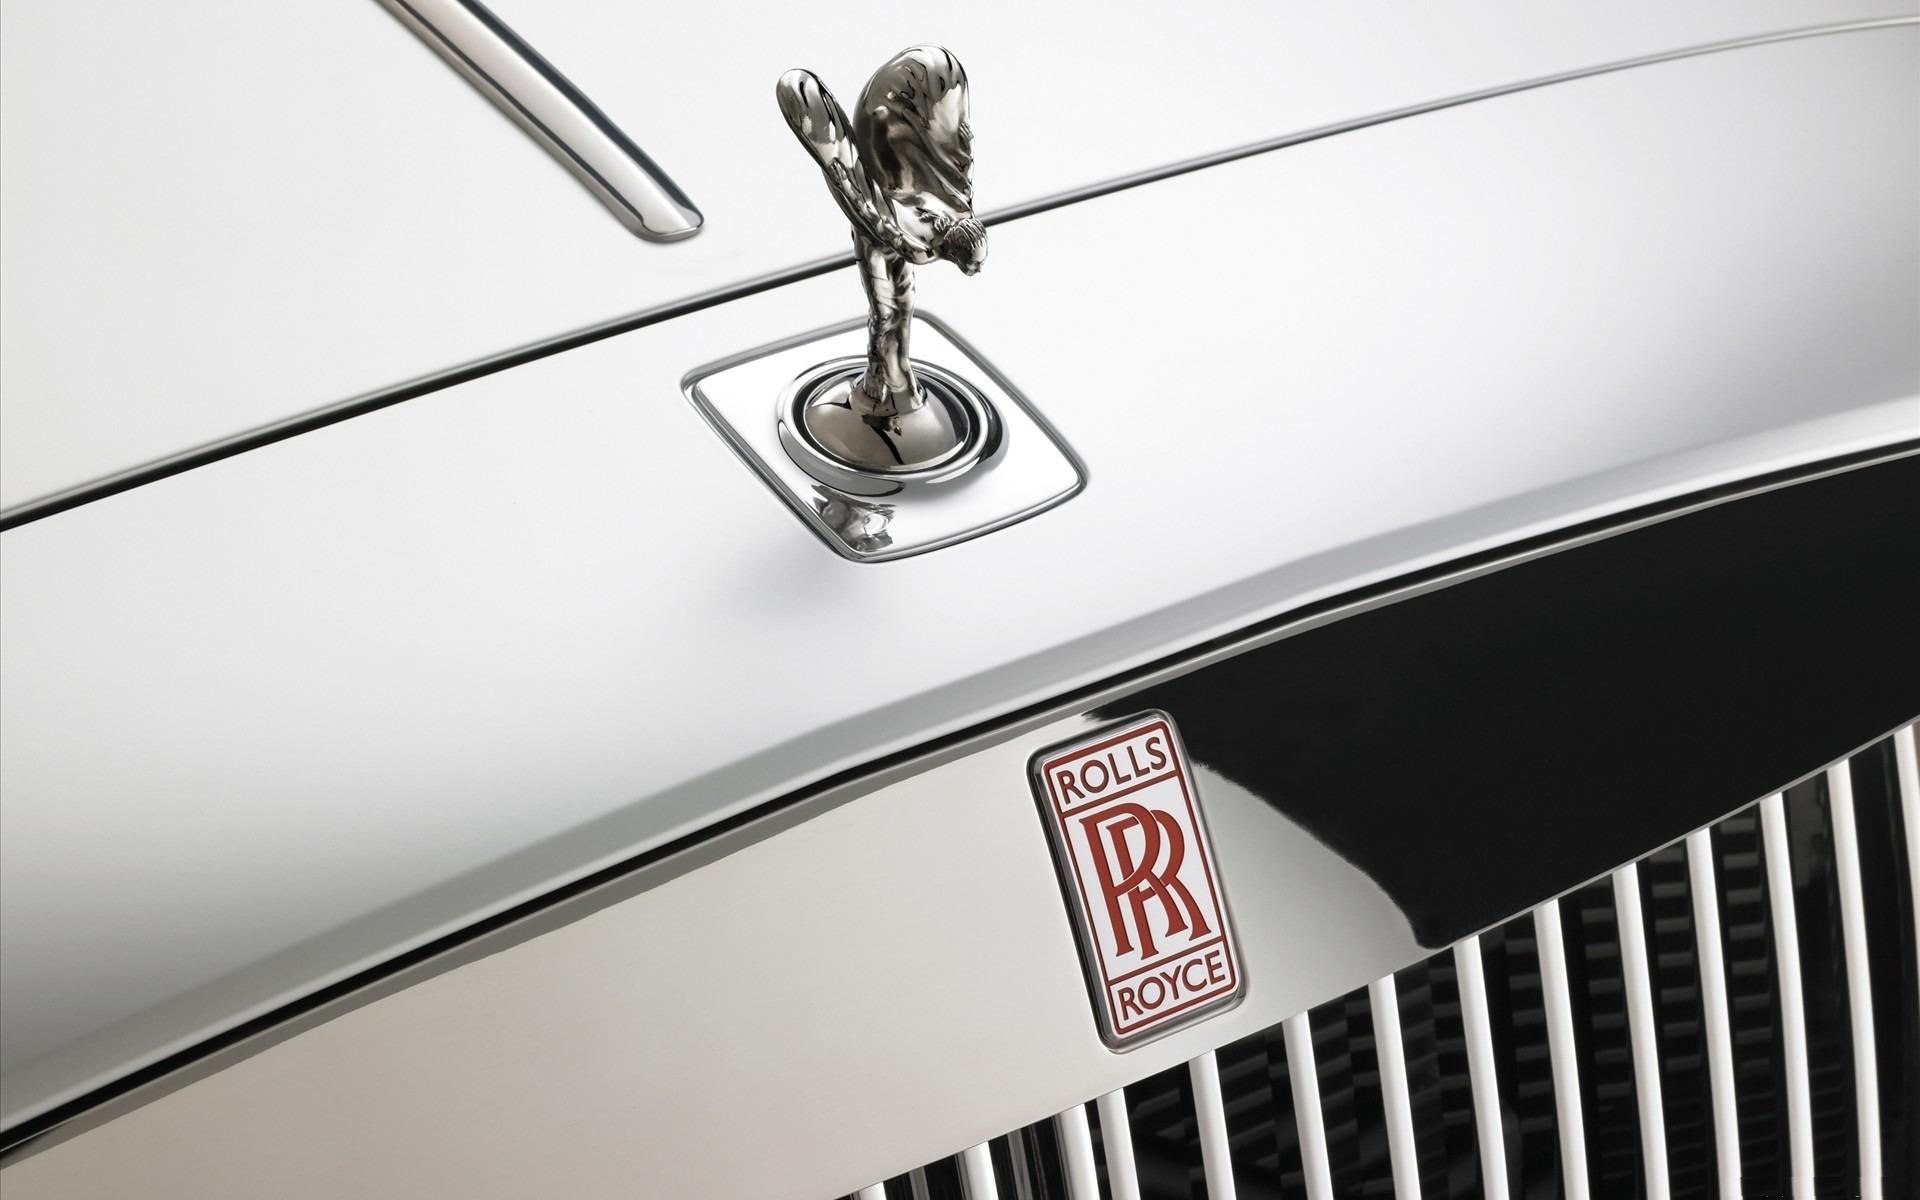 Rolls Royce Meninjau Opsi Neraca Keuangan Setelah Serangan